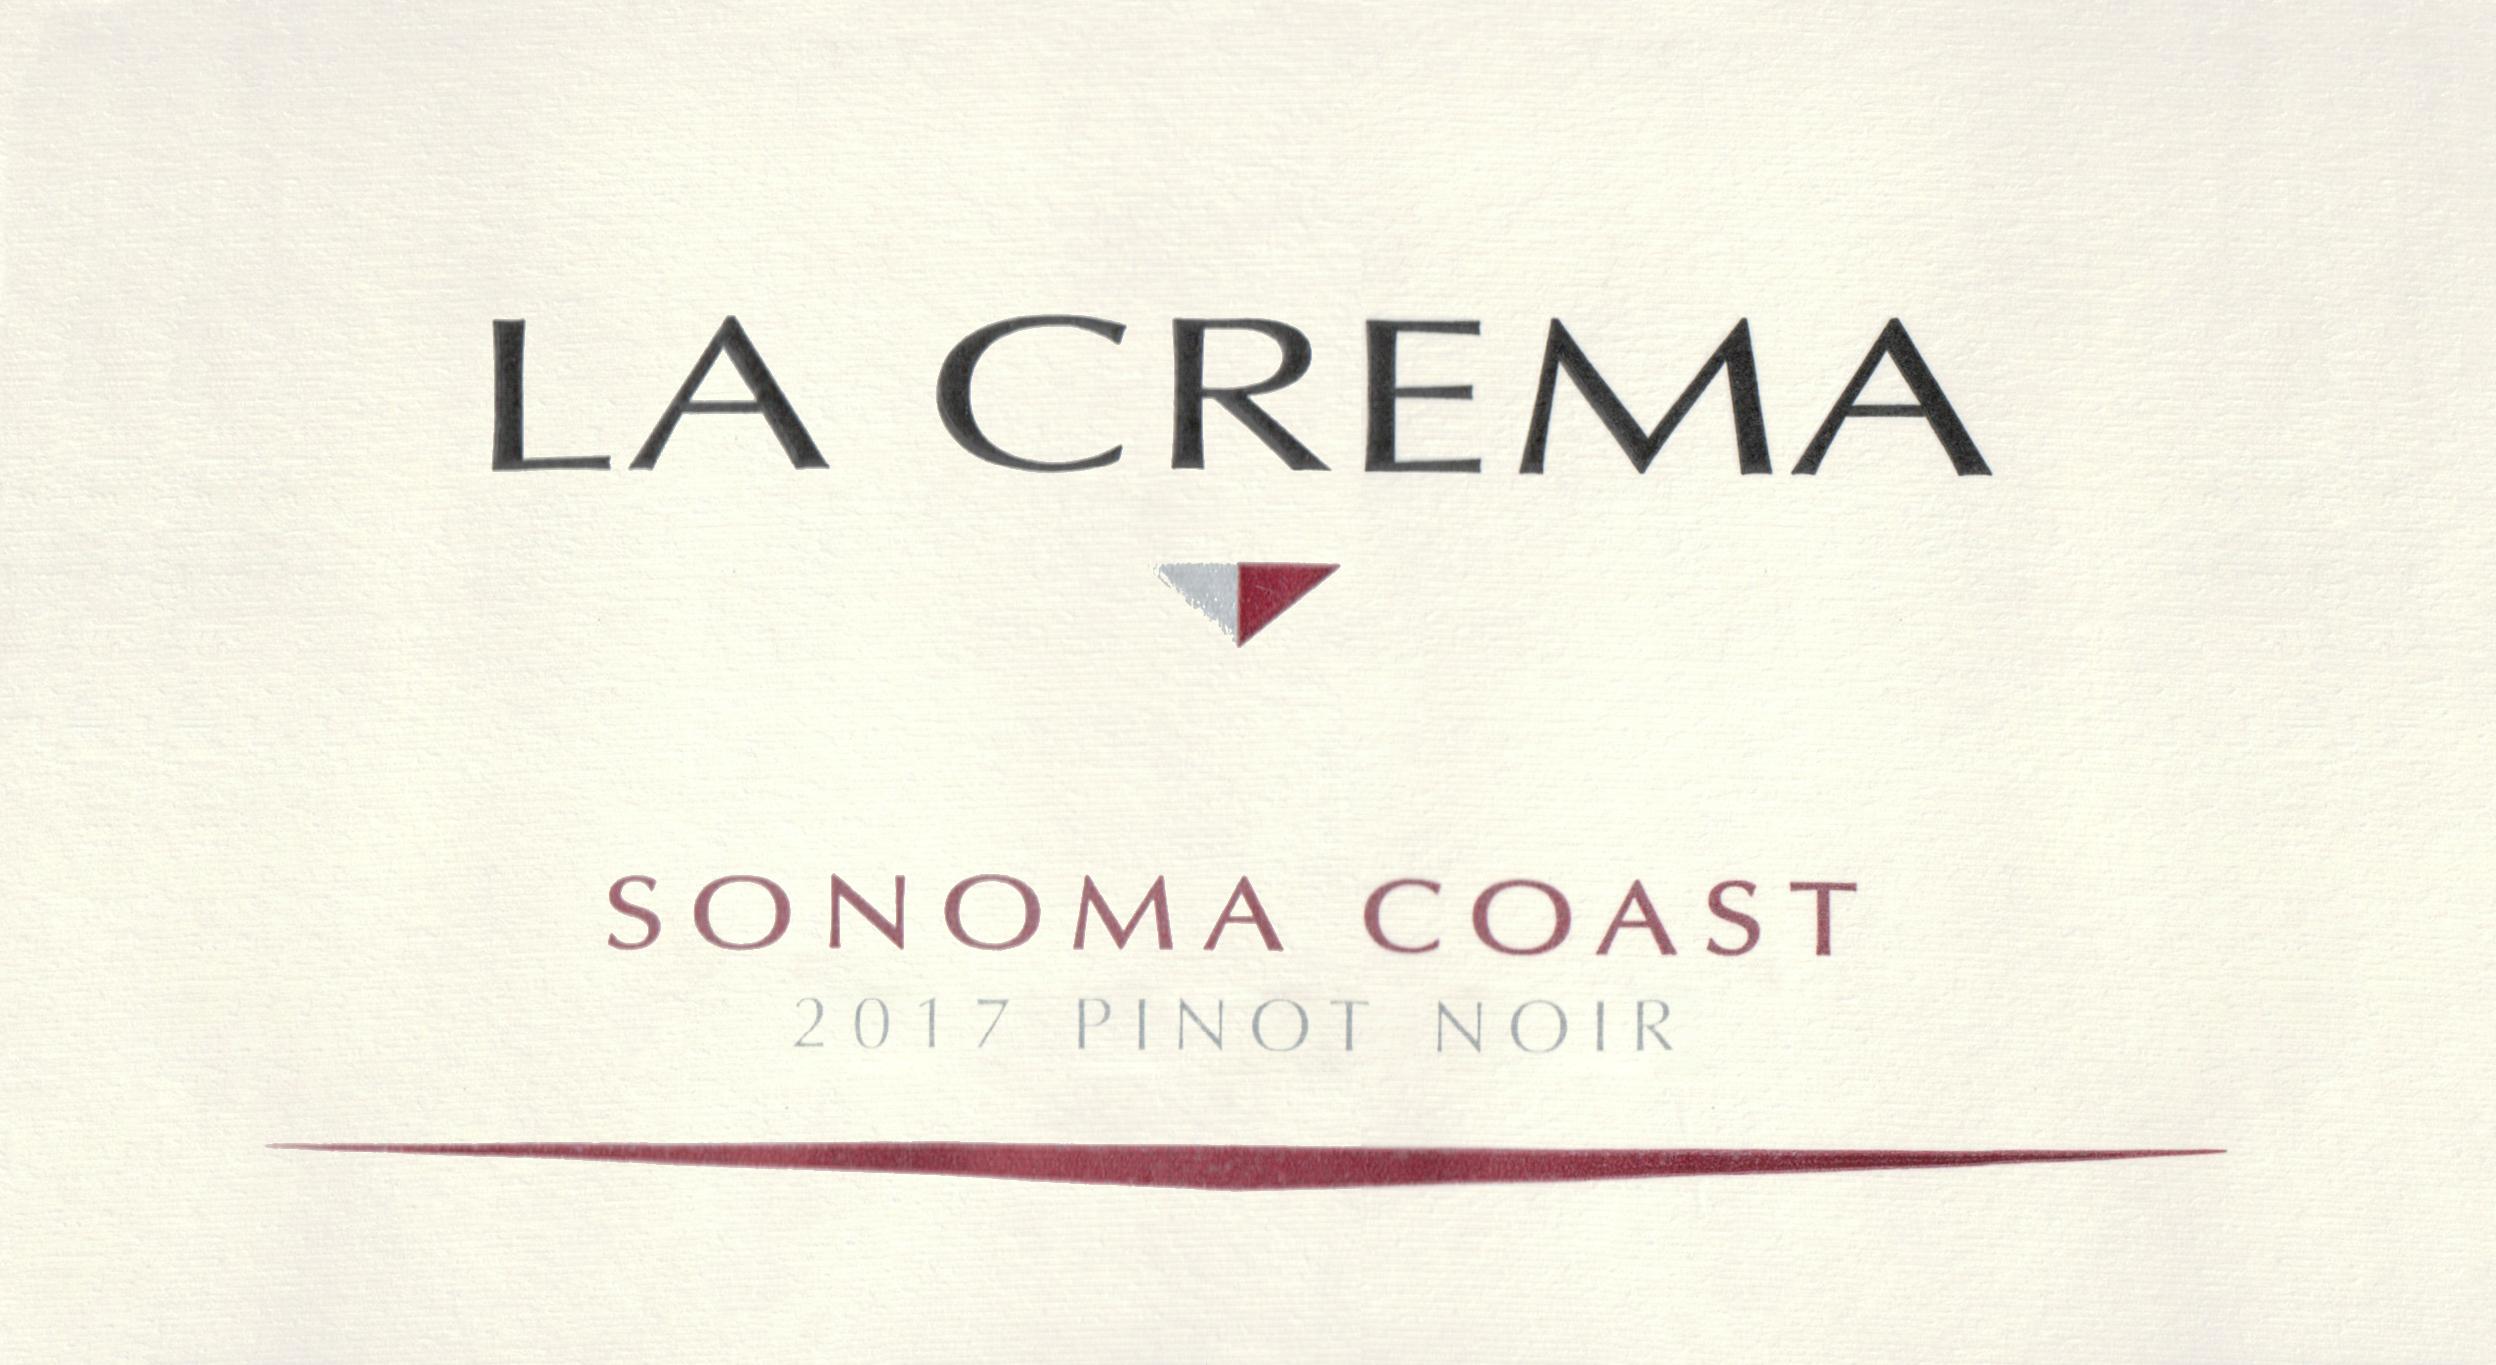 La Crema Pinot Noir 2017